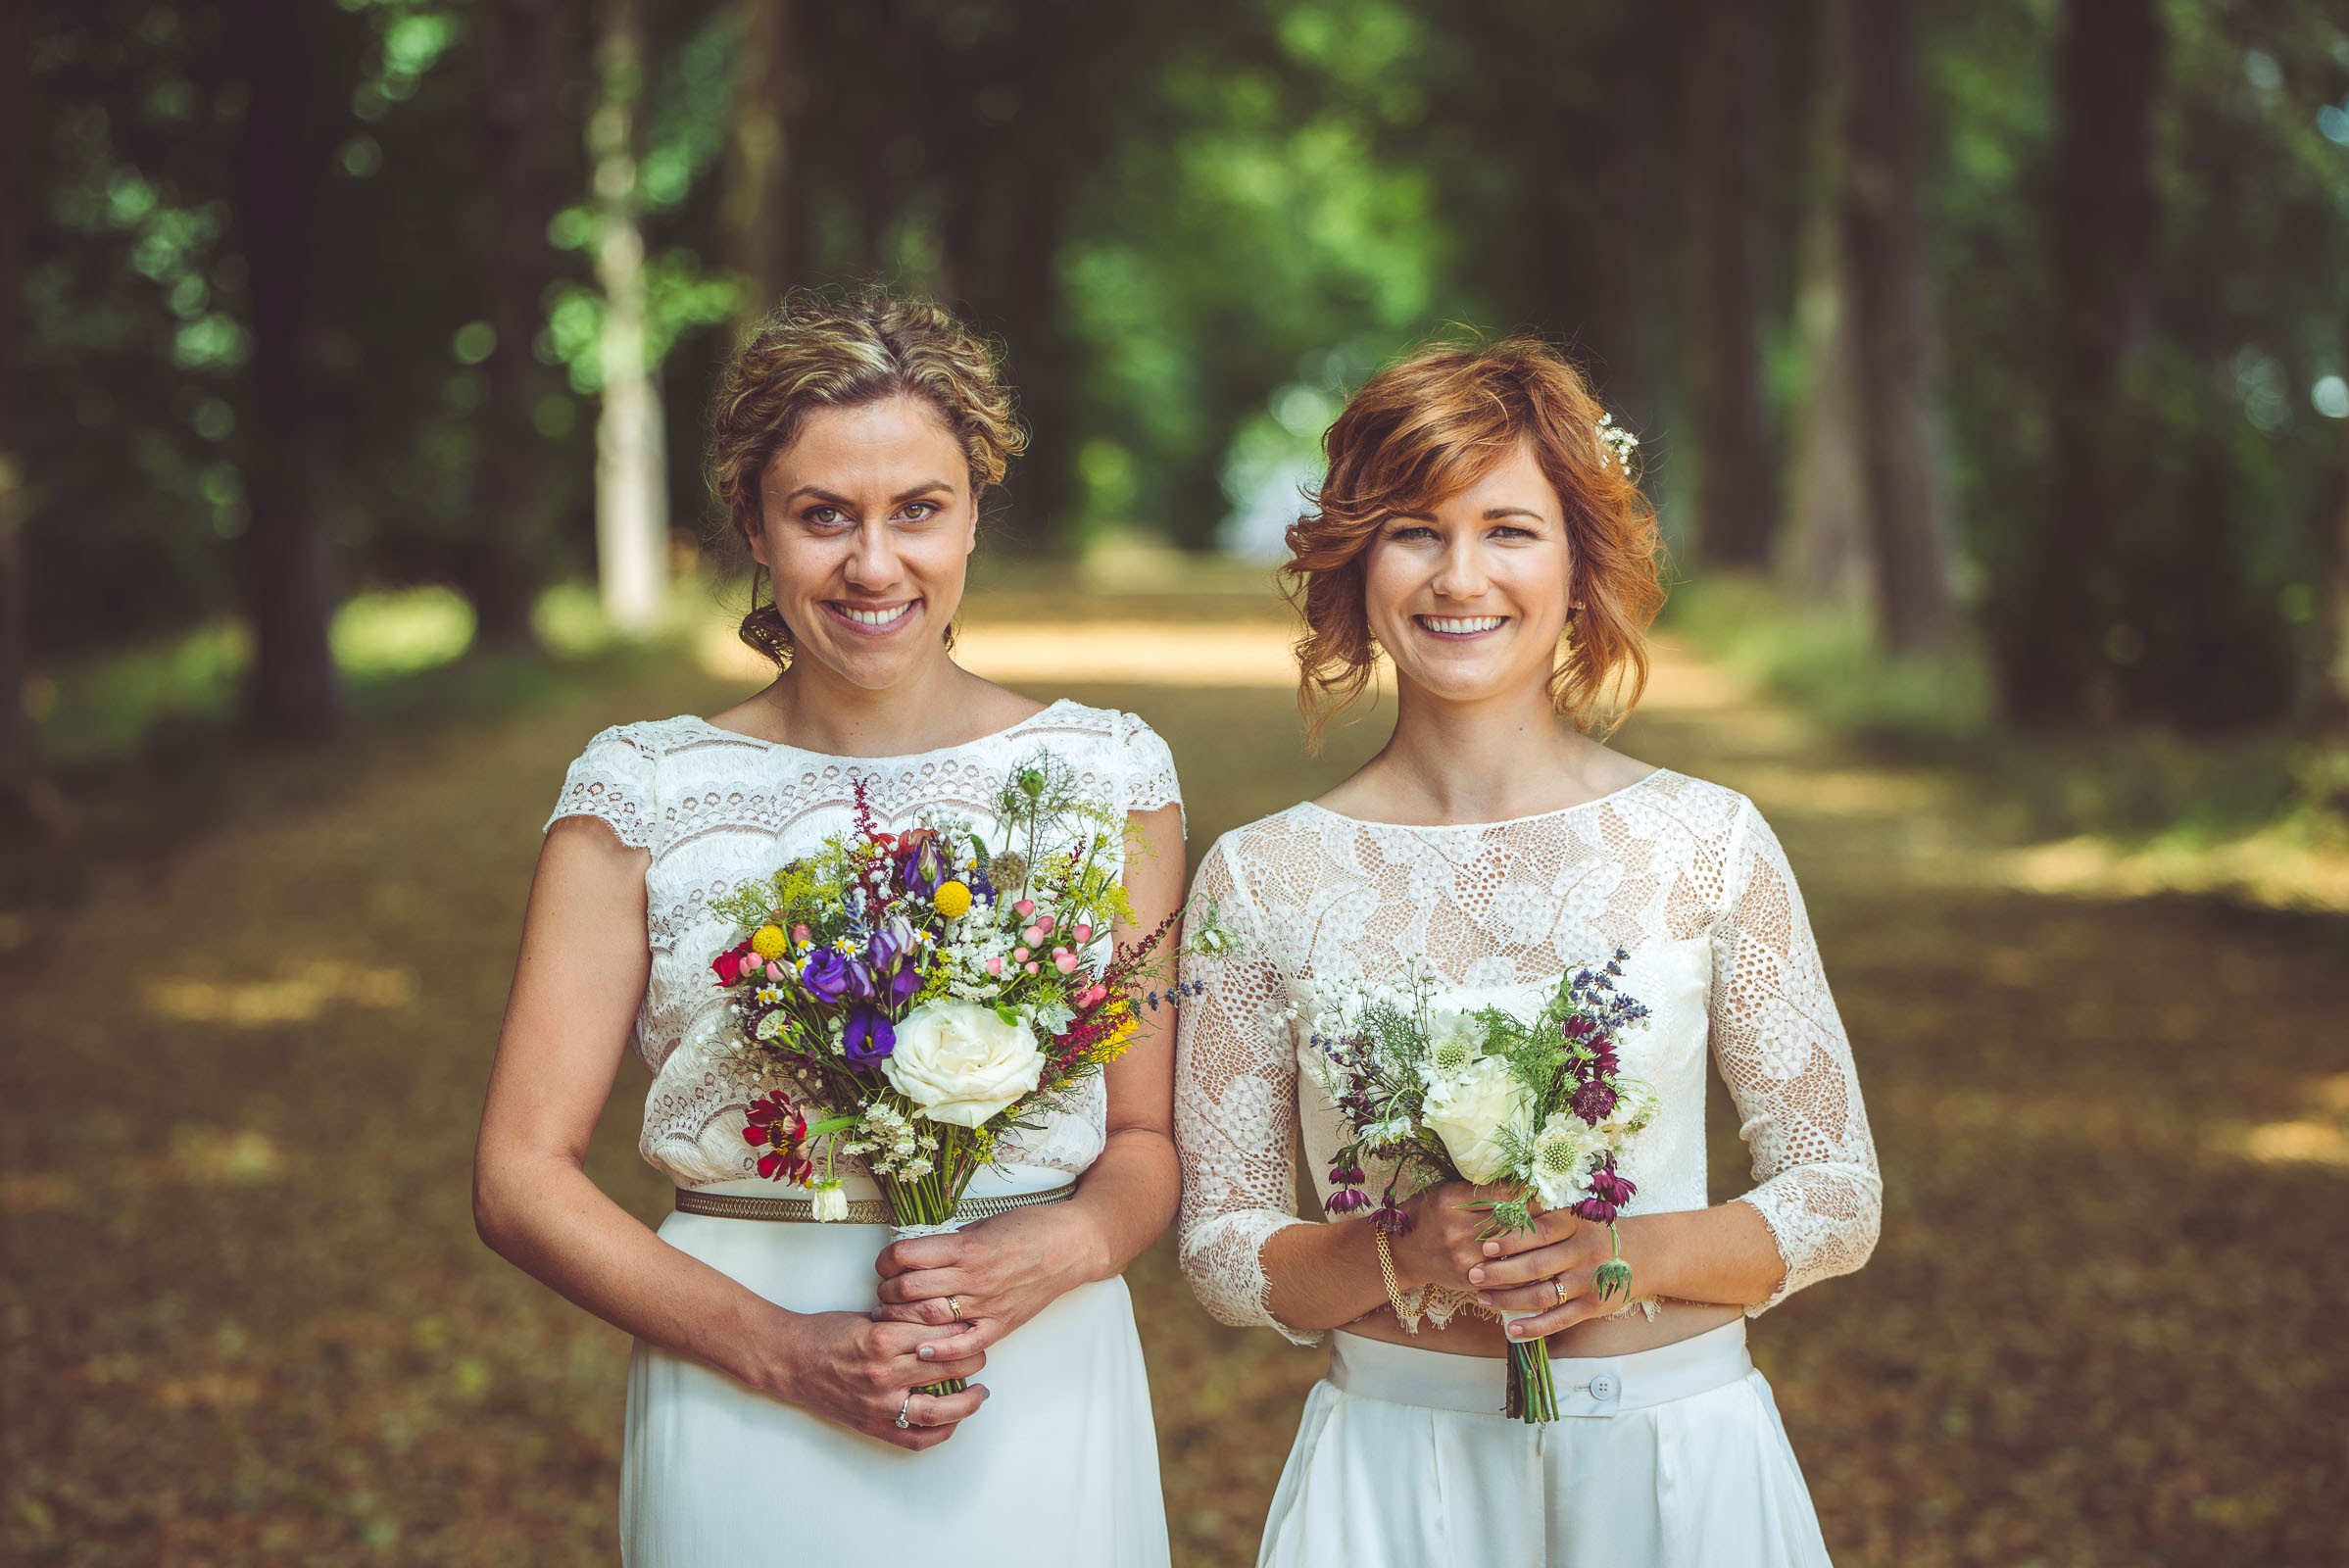 Hitchin_wedding_St_Pauls_Waldenbury_Royston_Wedding_Photographer-40.jpg